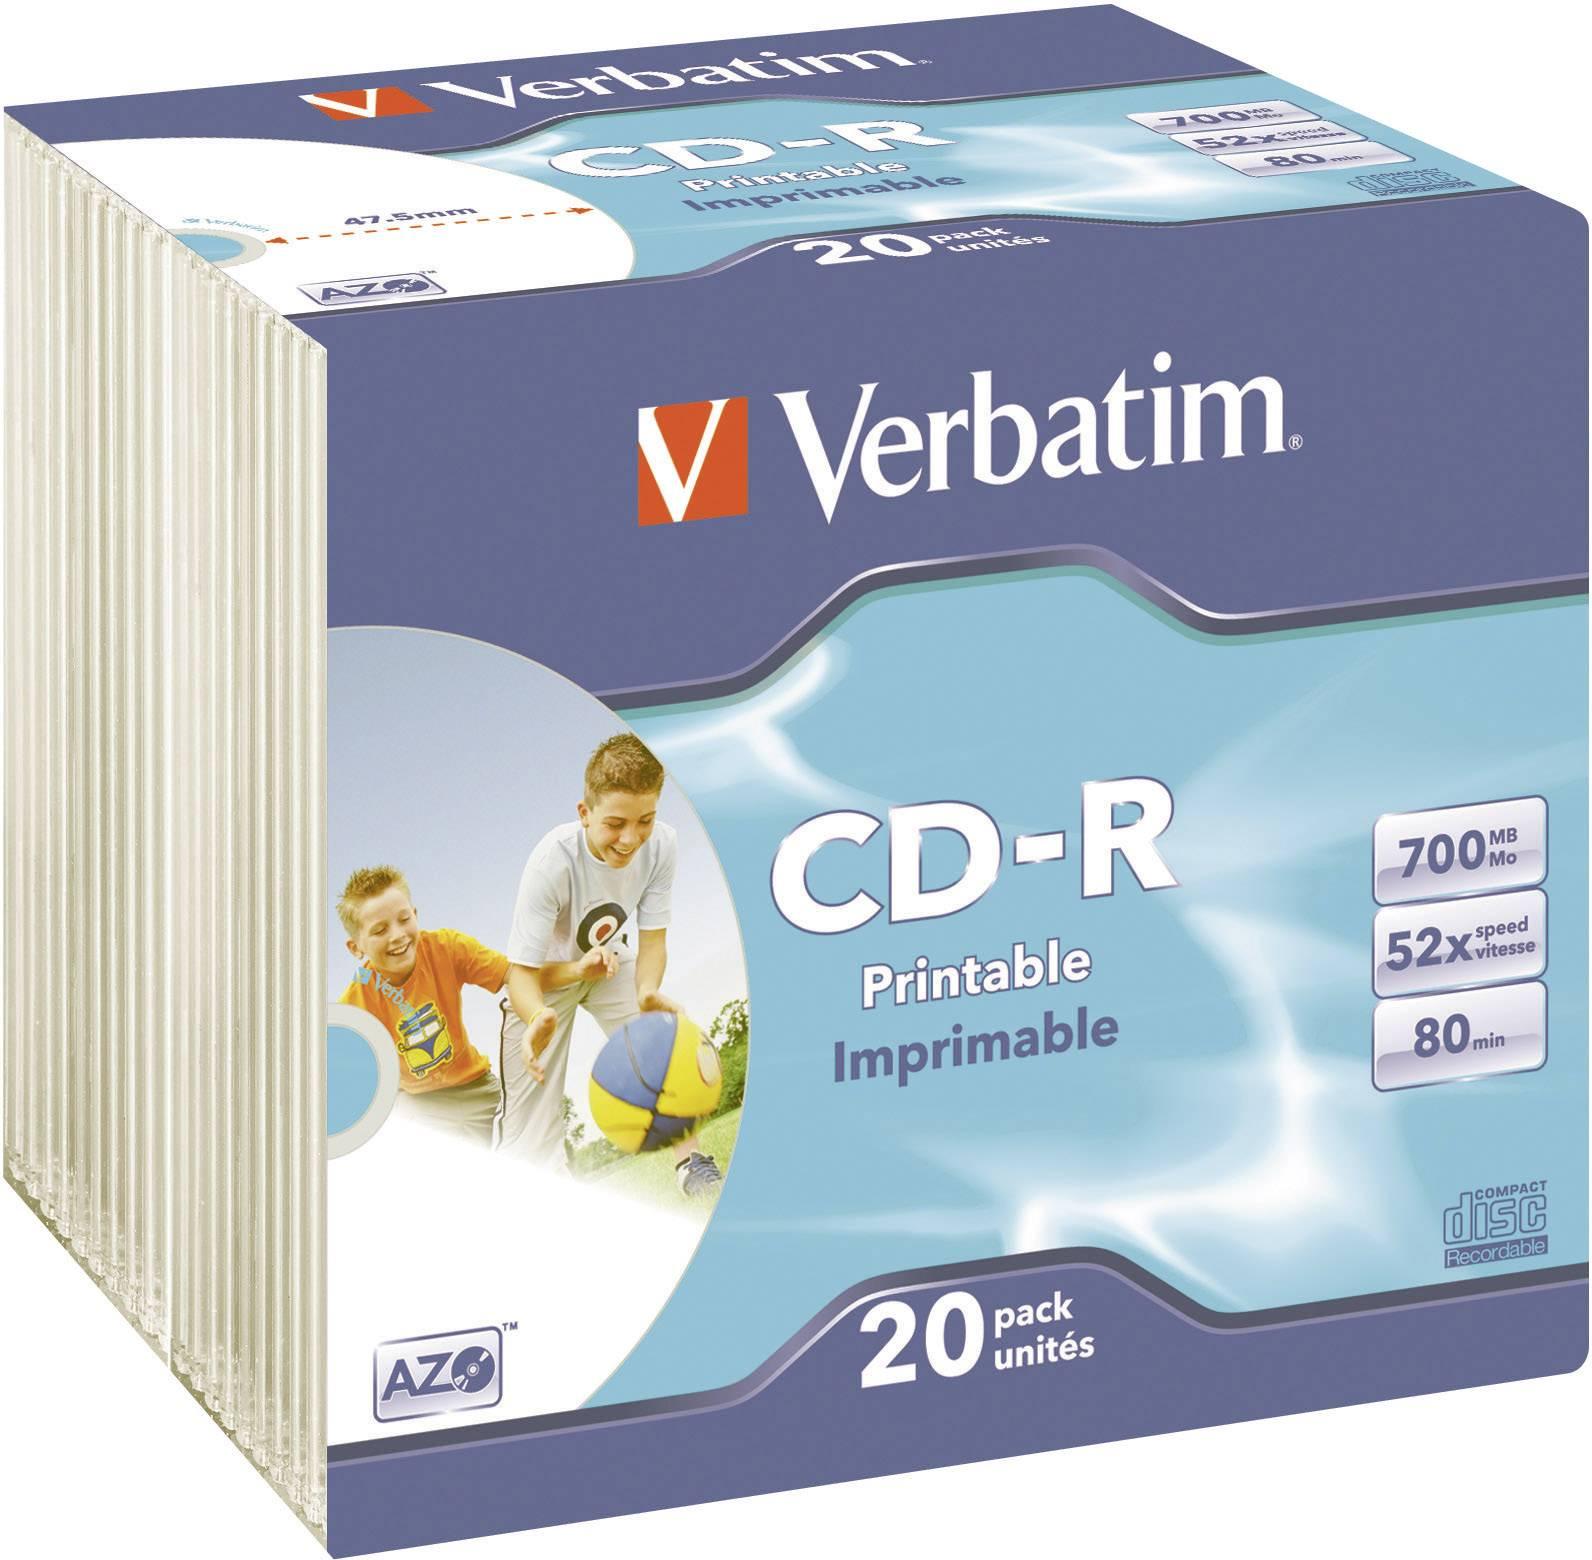 Verbatim CD-R80 700MB 52X 20 ks SC PRINT